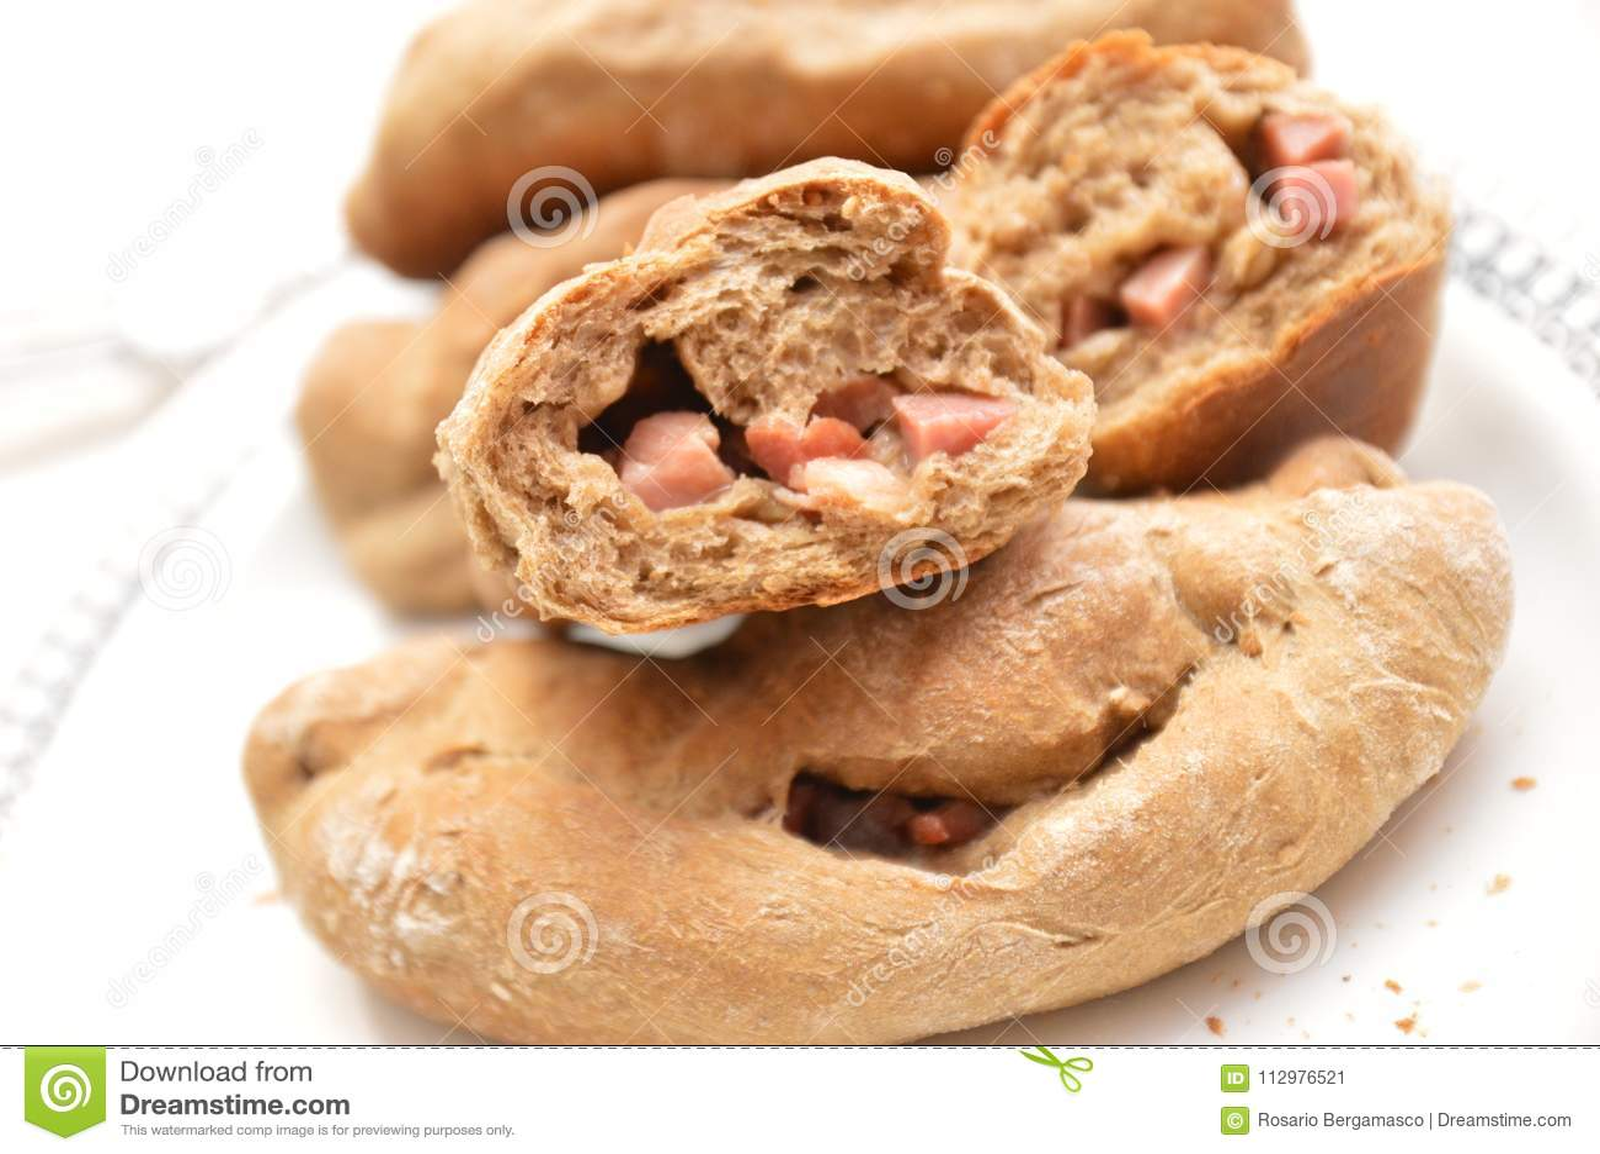 Italian traditional bread of Napoli city